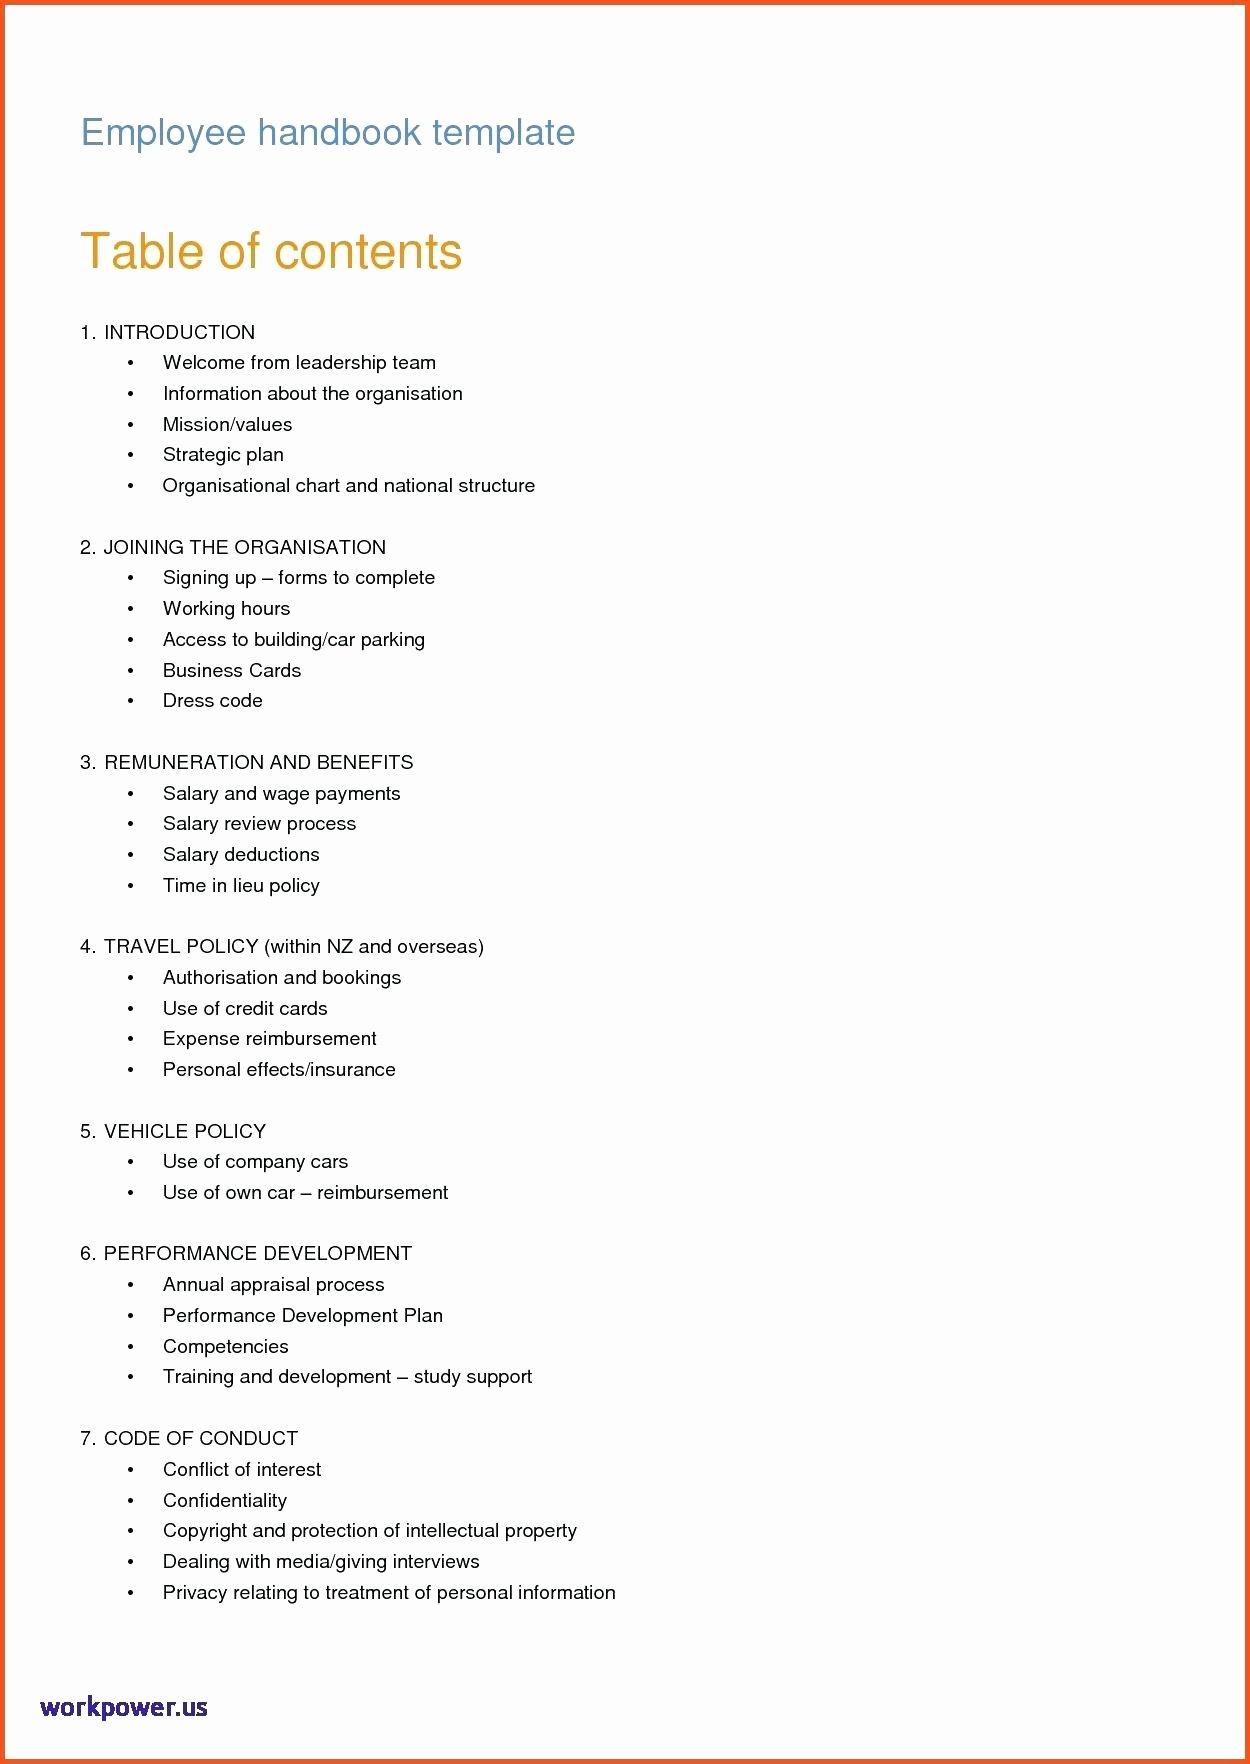 Restaurant Employee Handbook Template Free Best Of Template Employee Handbook Template Canada